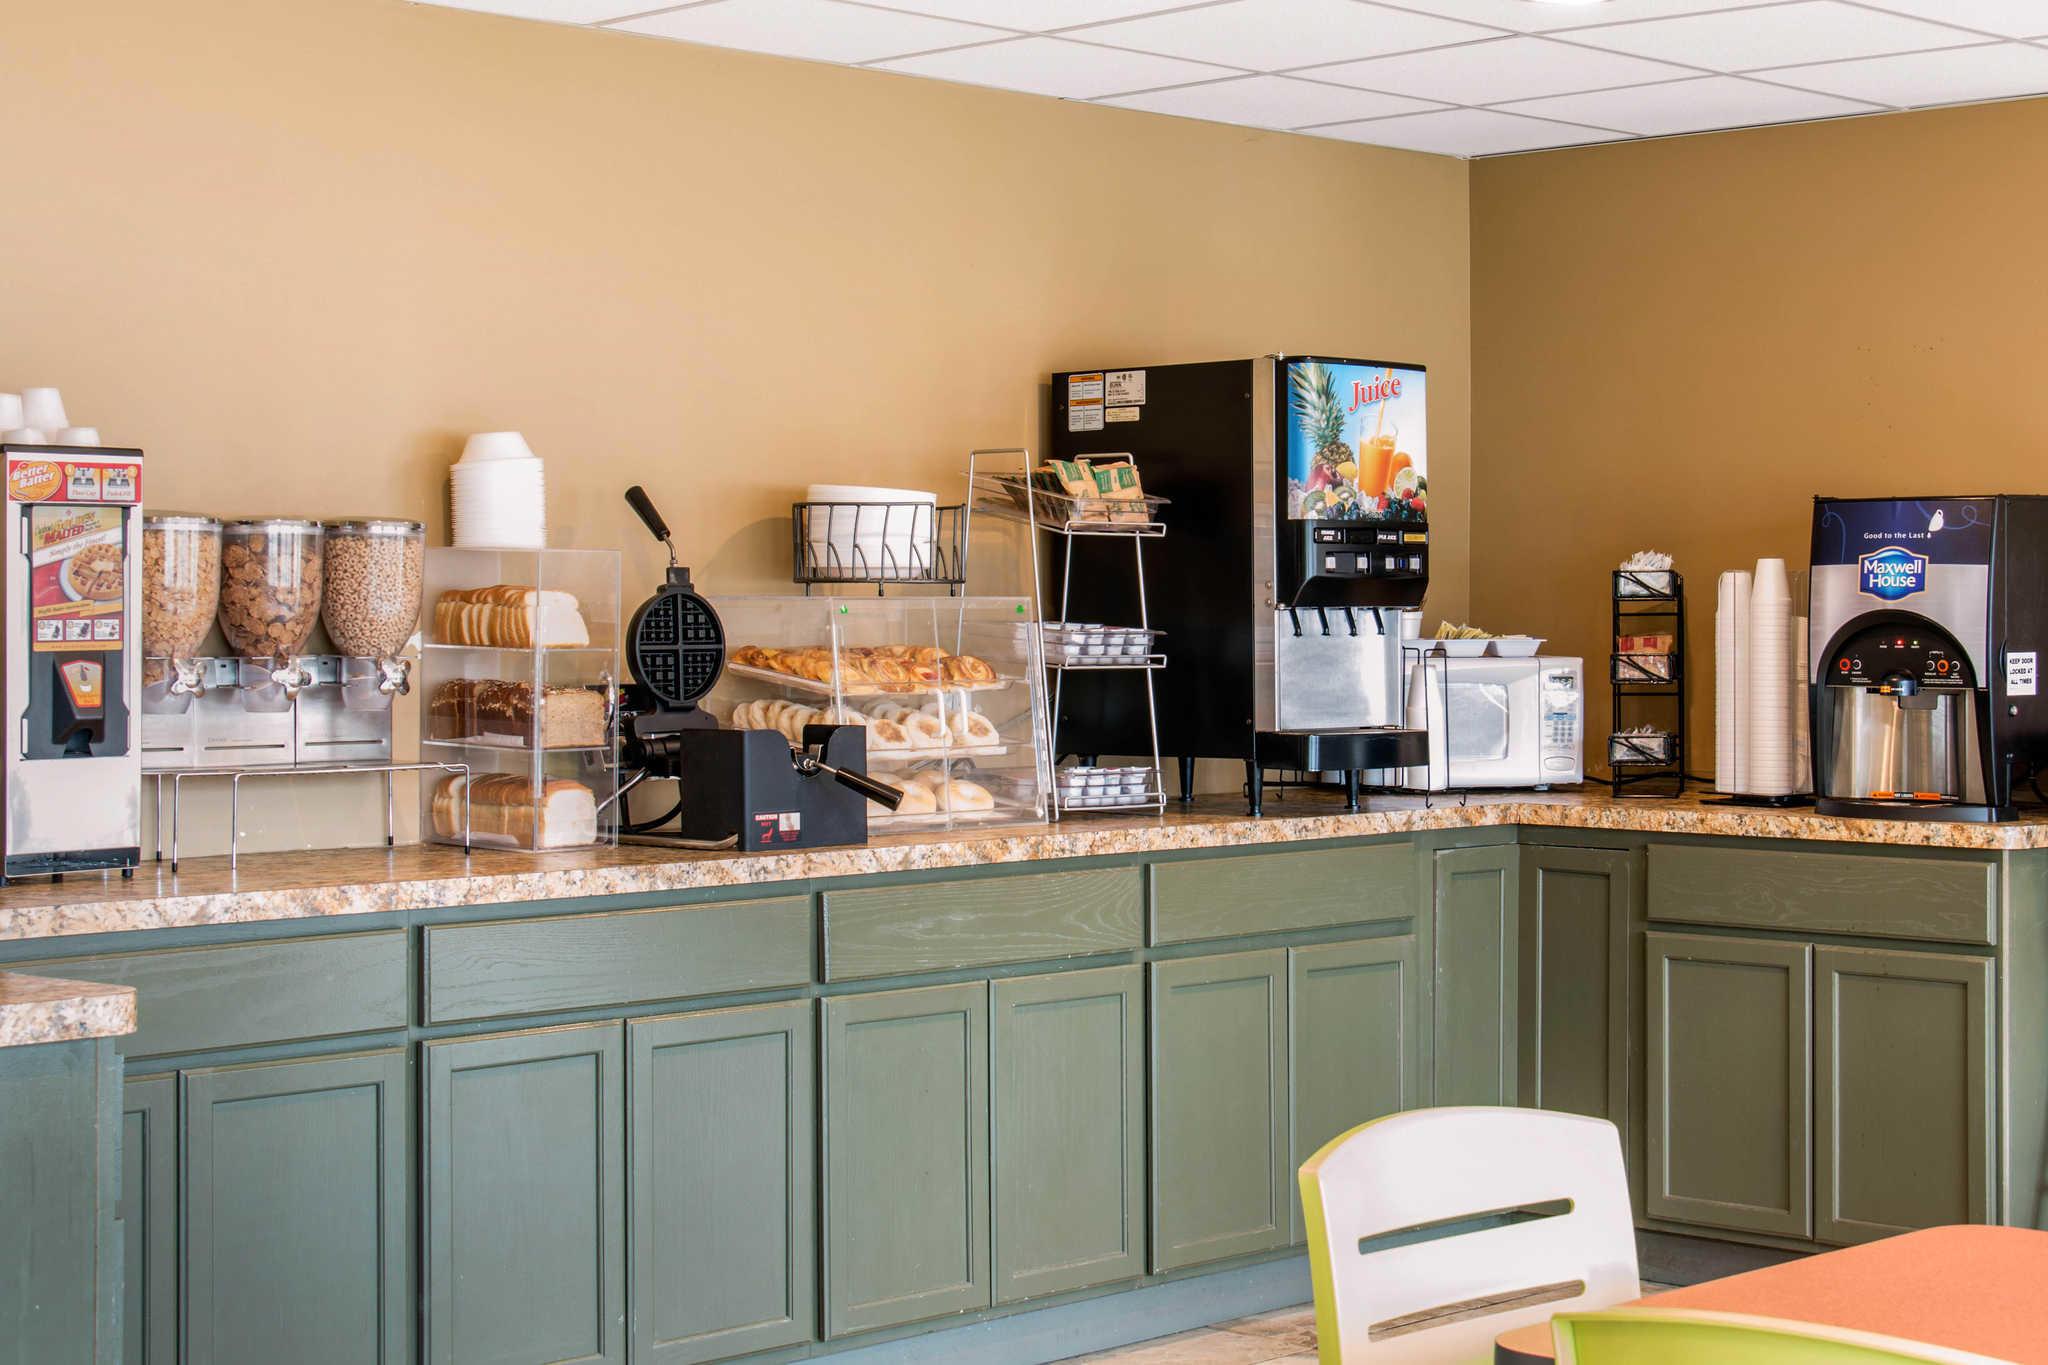 Econo Lodge Inn & Suites image 17